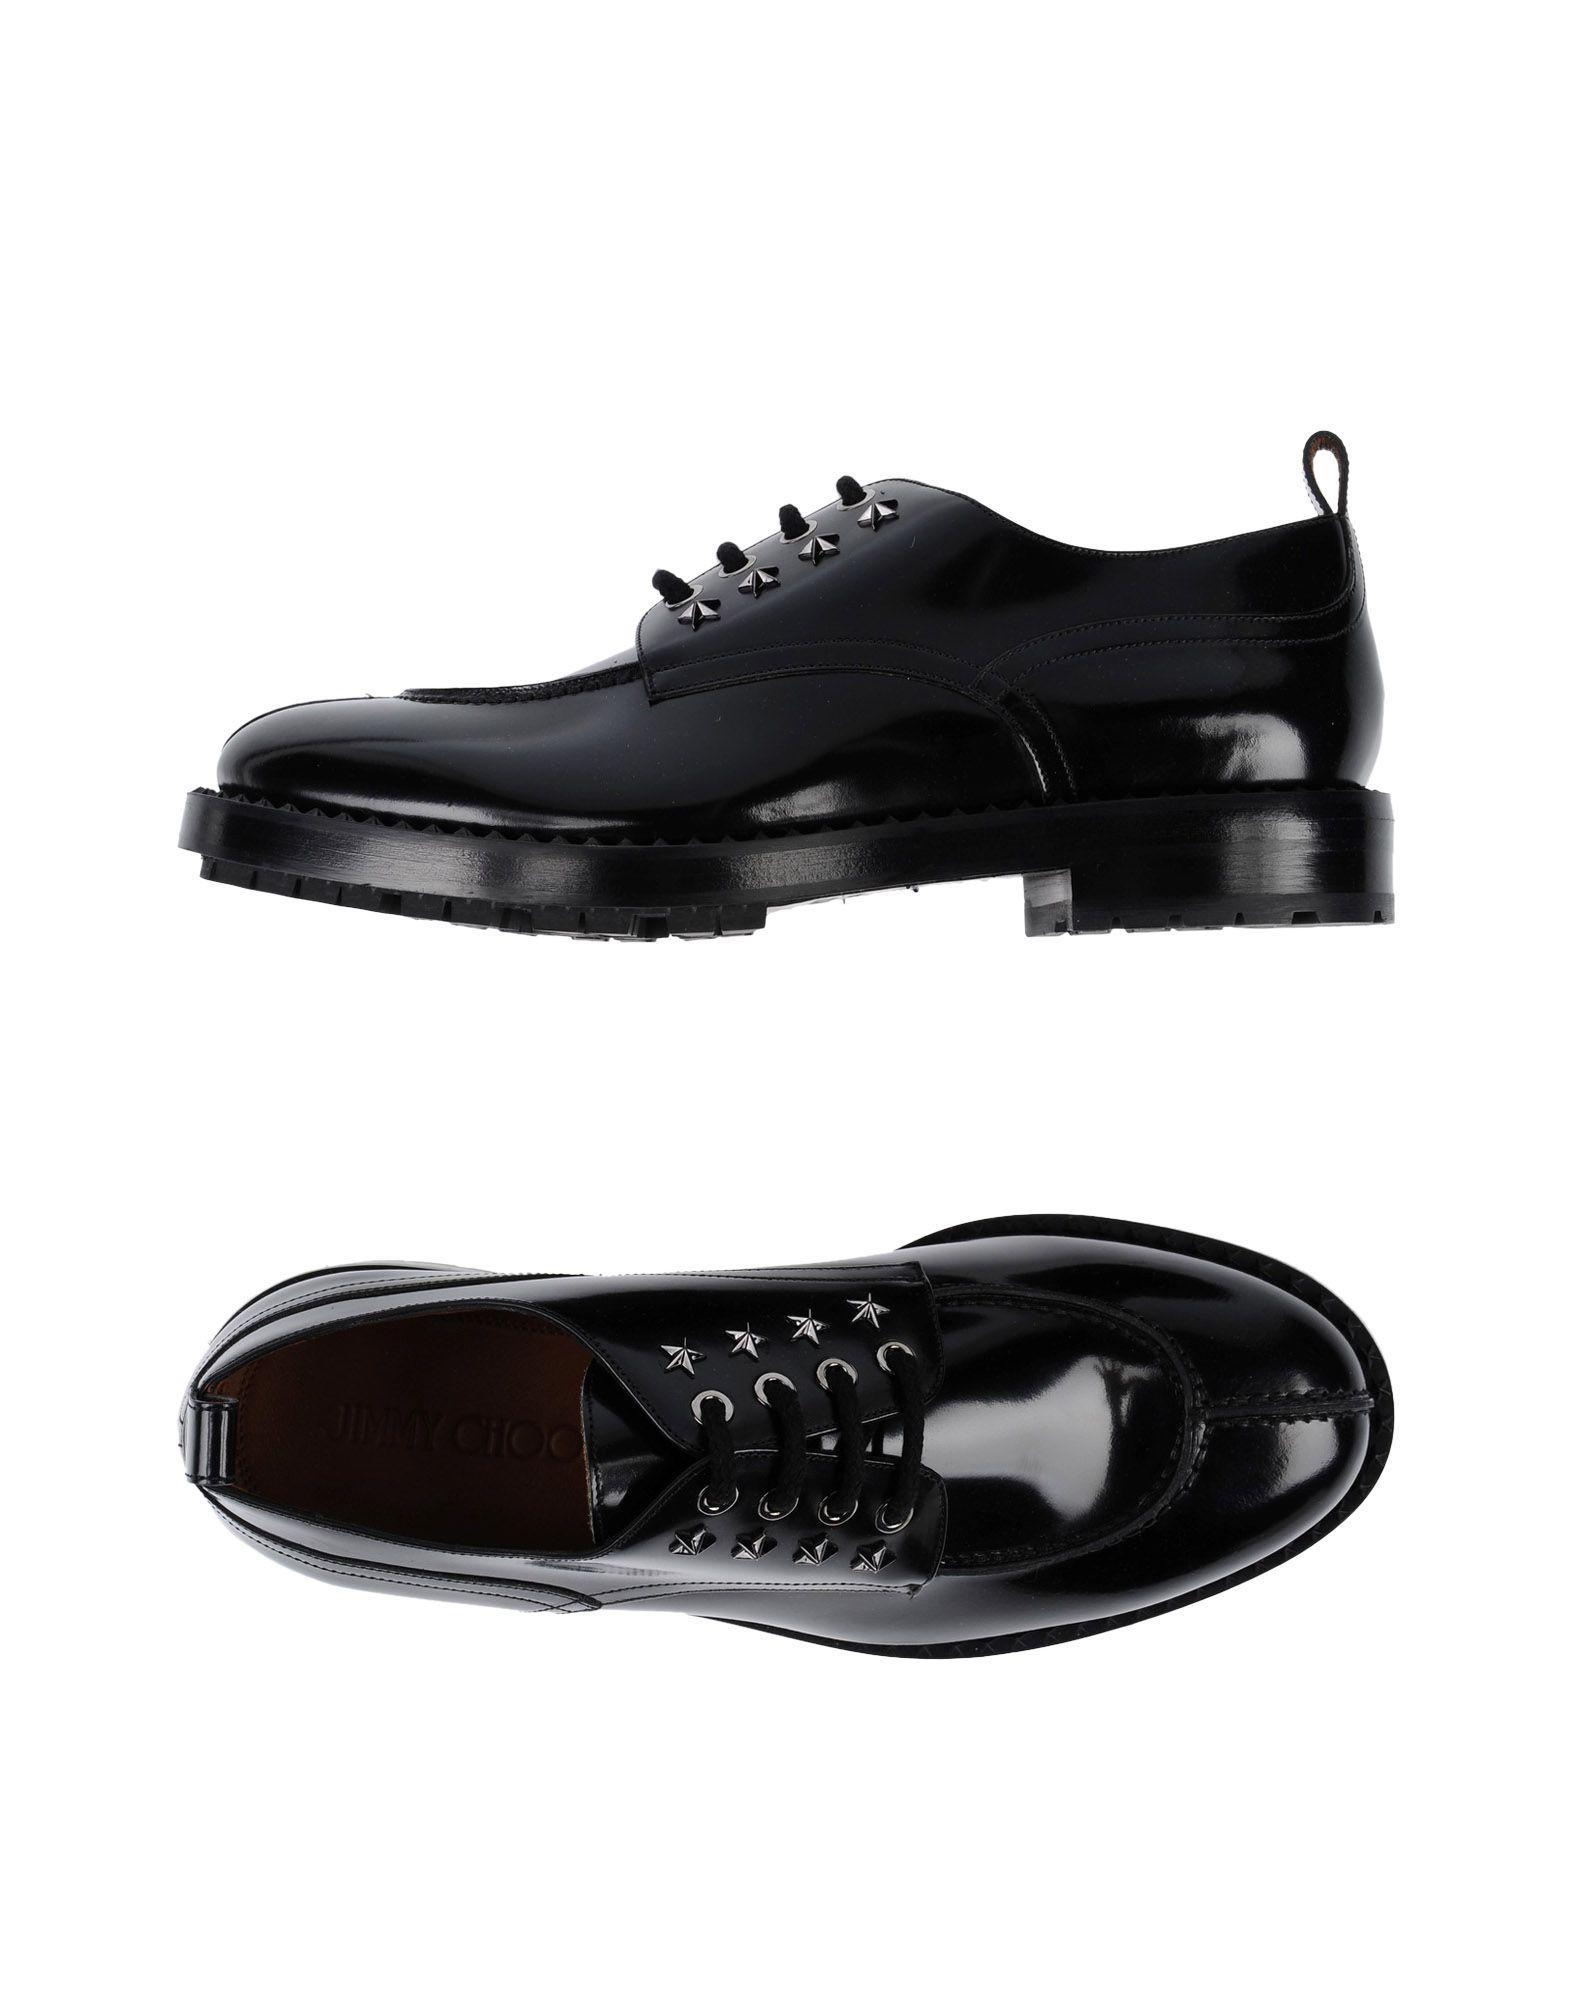 Jimmy Choo Schnürschuhe Herren  11463686VA Gute Qualität beliebte Schuhe